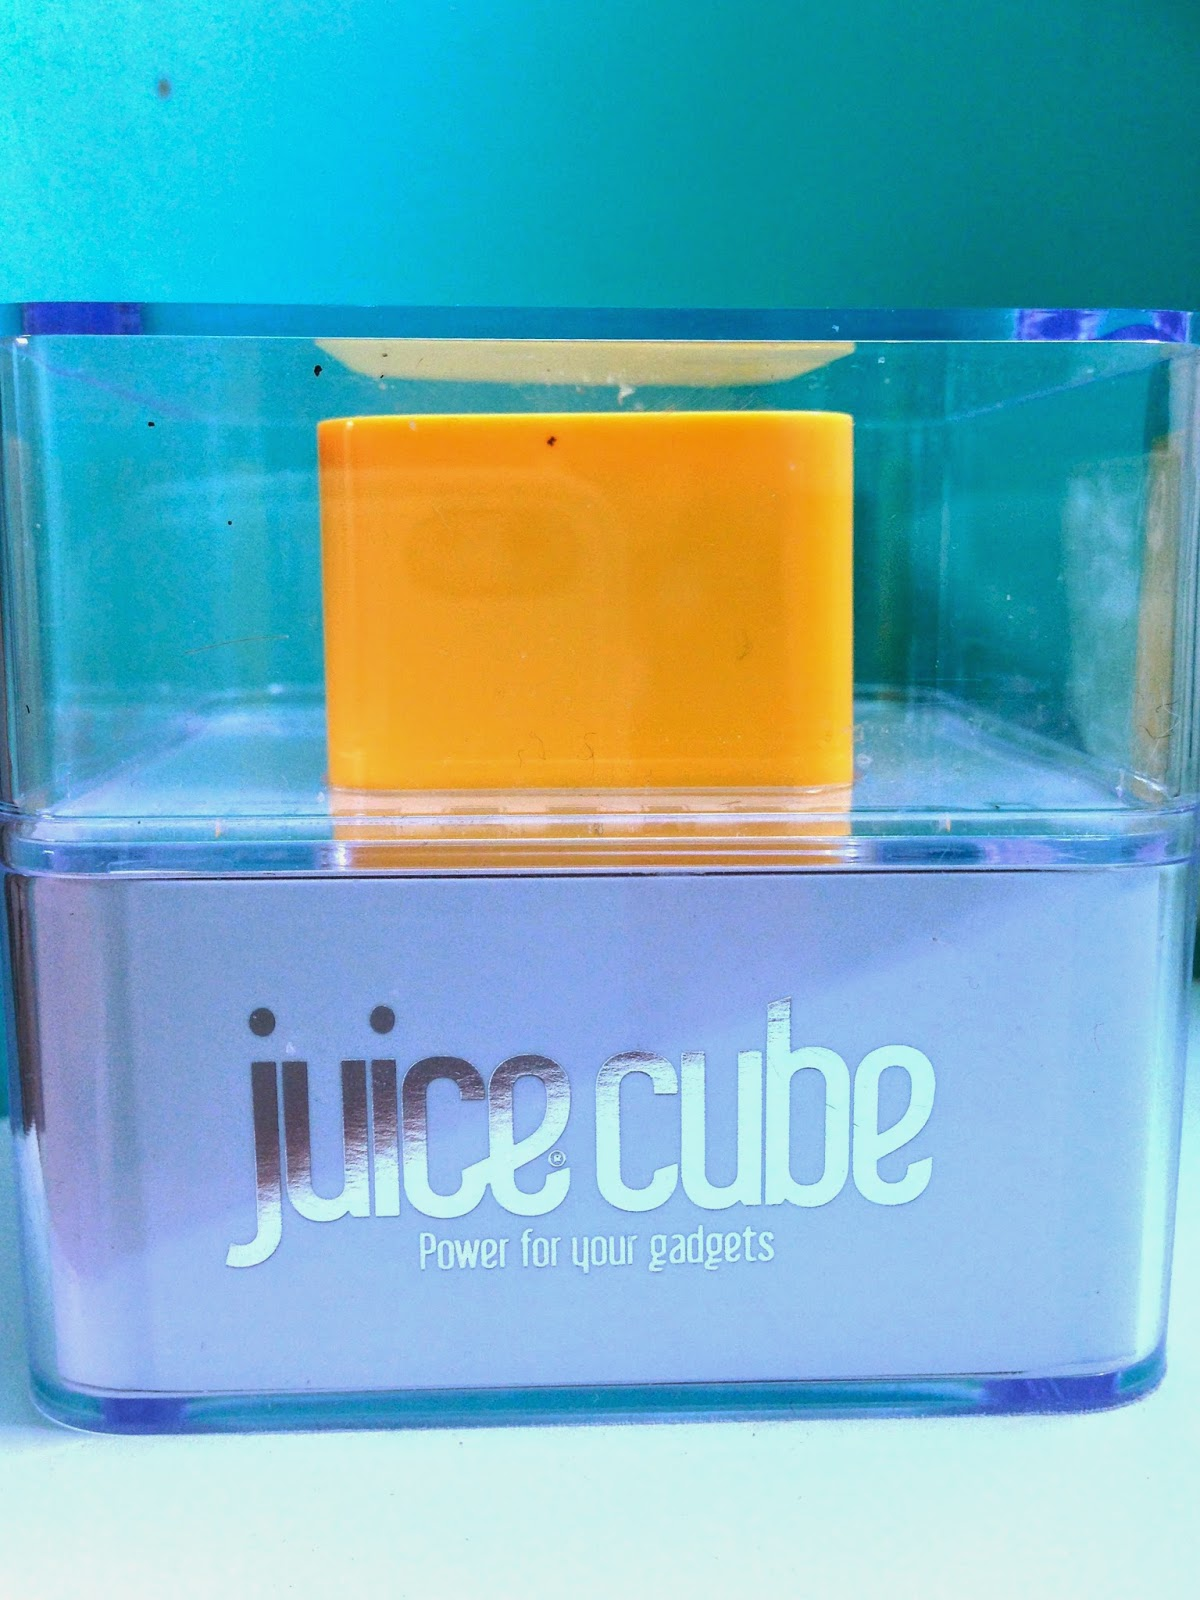 The Juice Cube